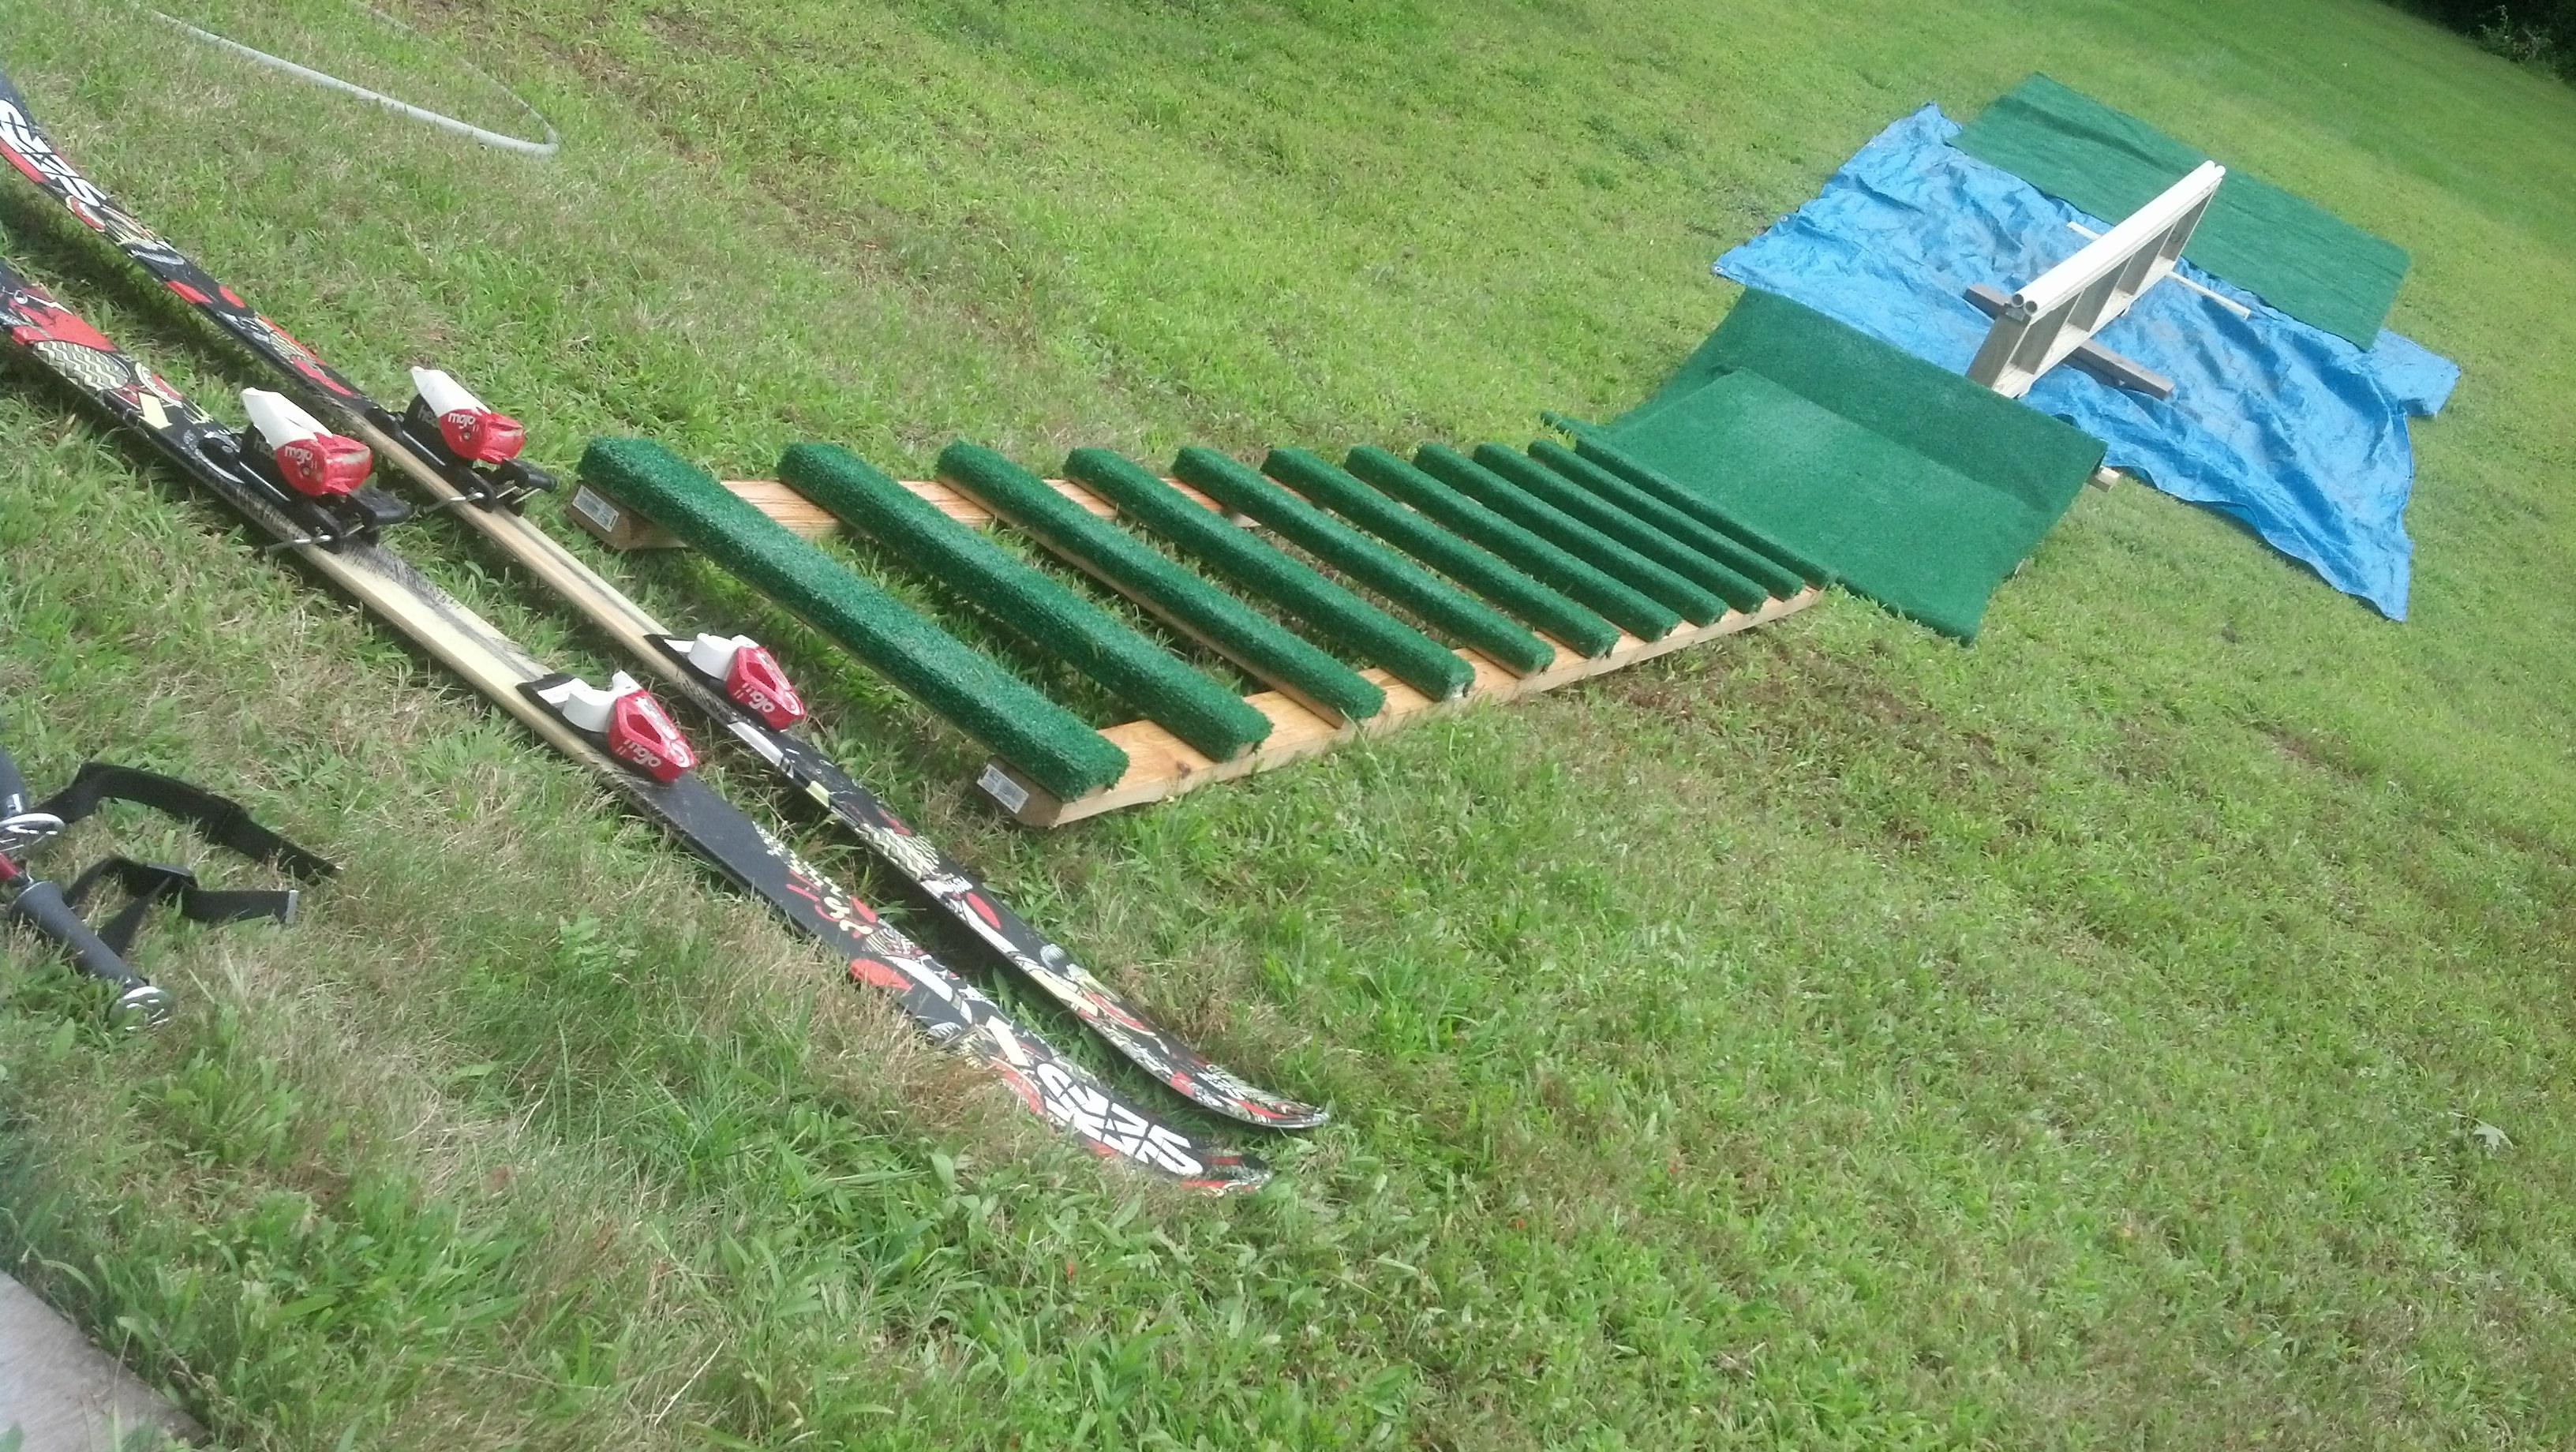 Backyard Rail setup, Improved!